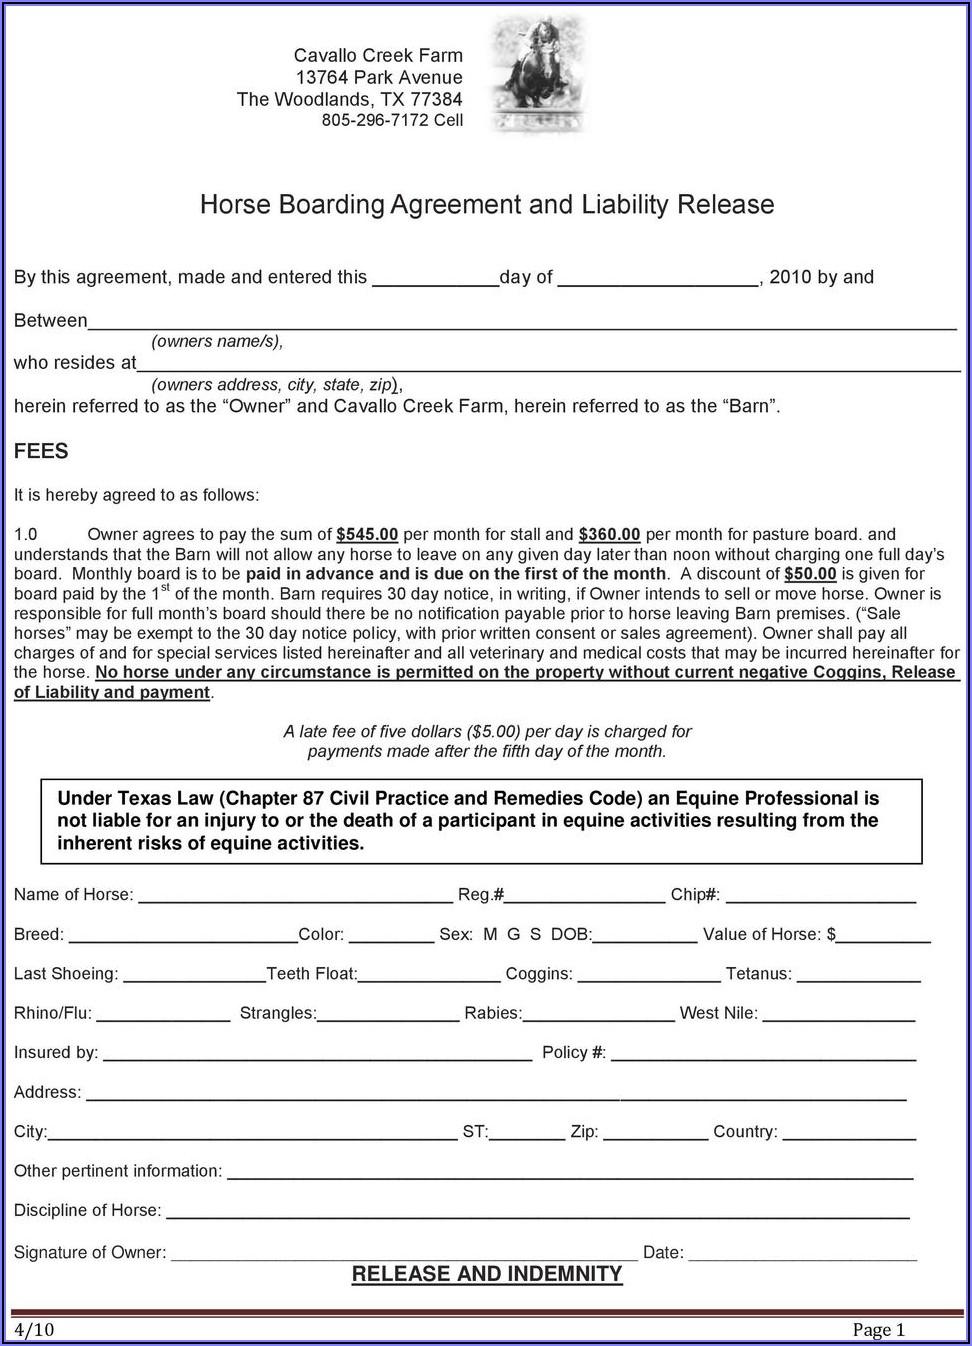 Ohio Equine Liability Release Form